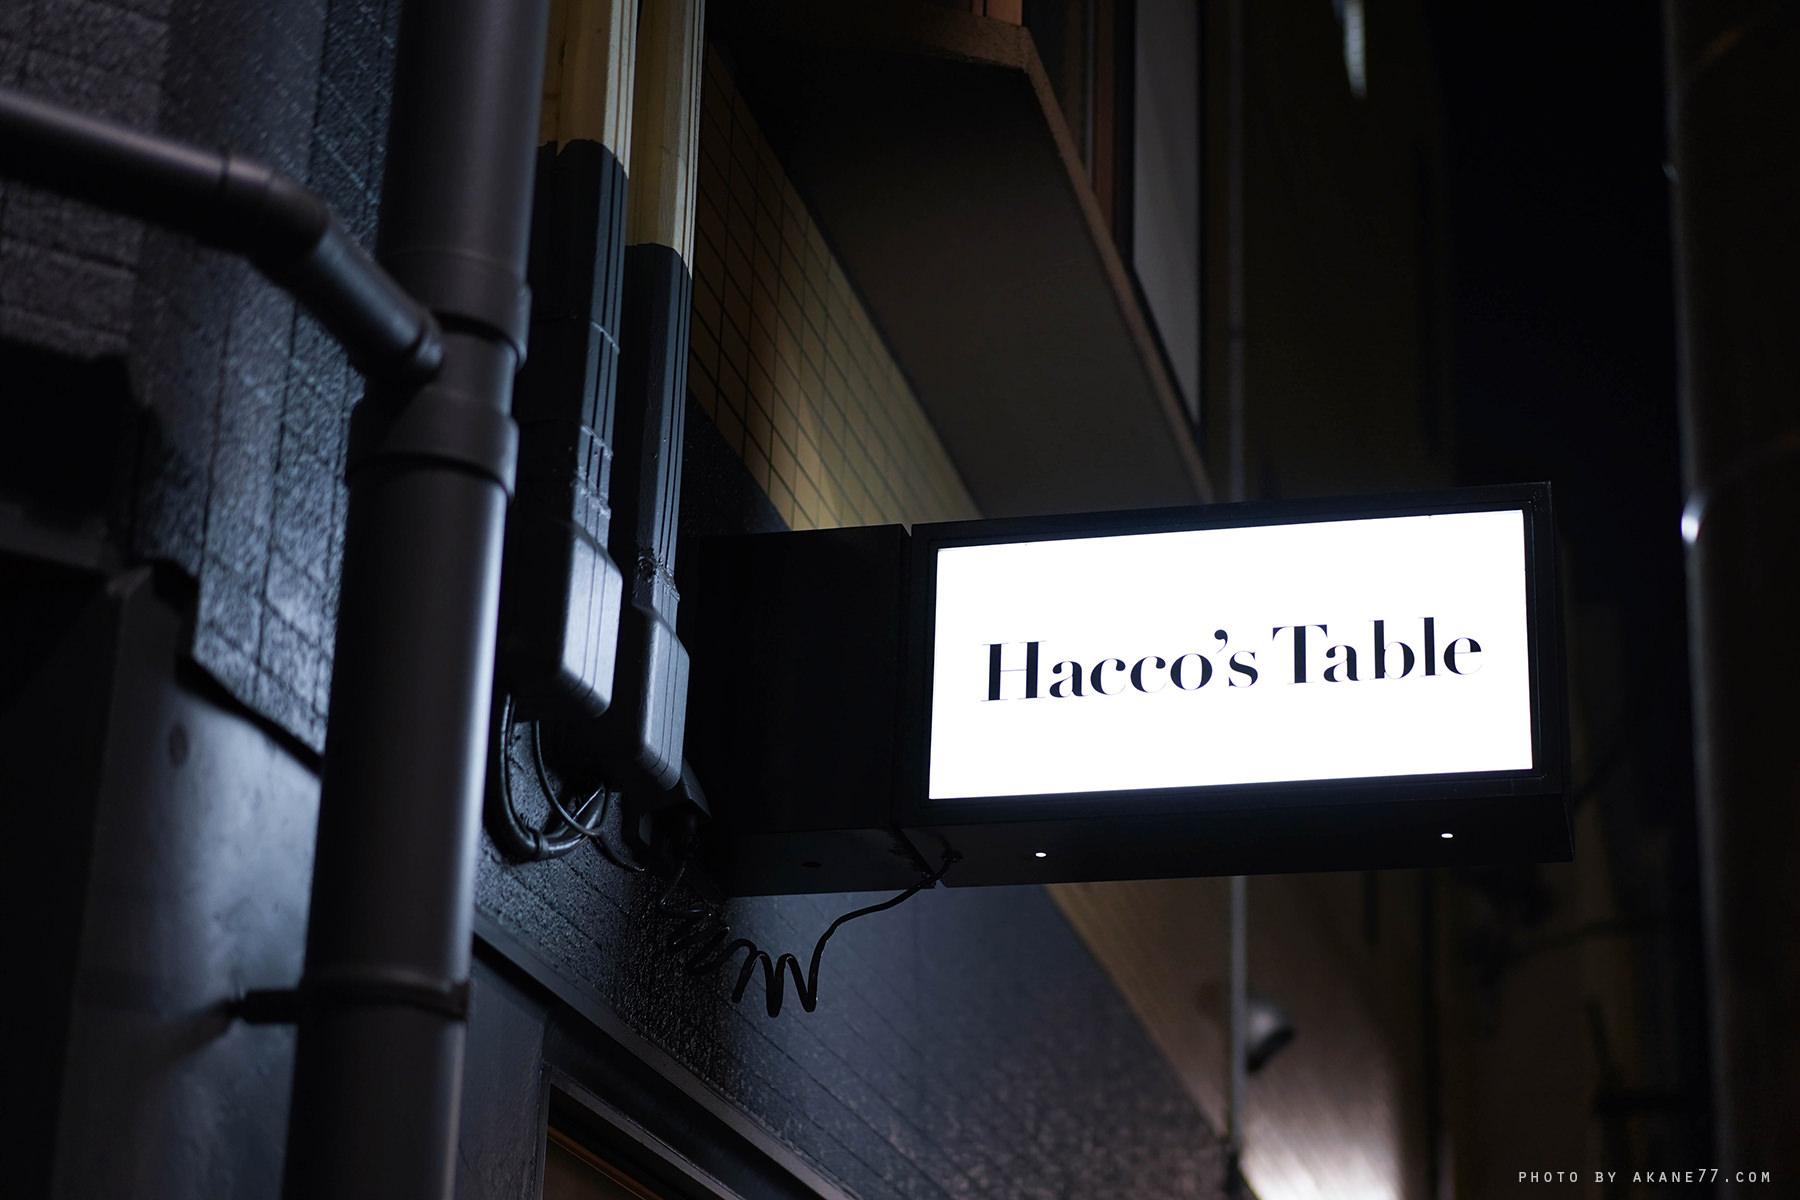 東京淺草美食Haccos table